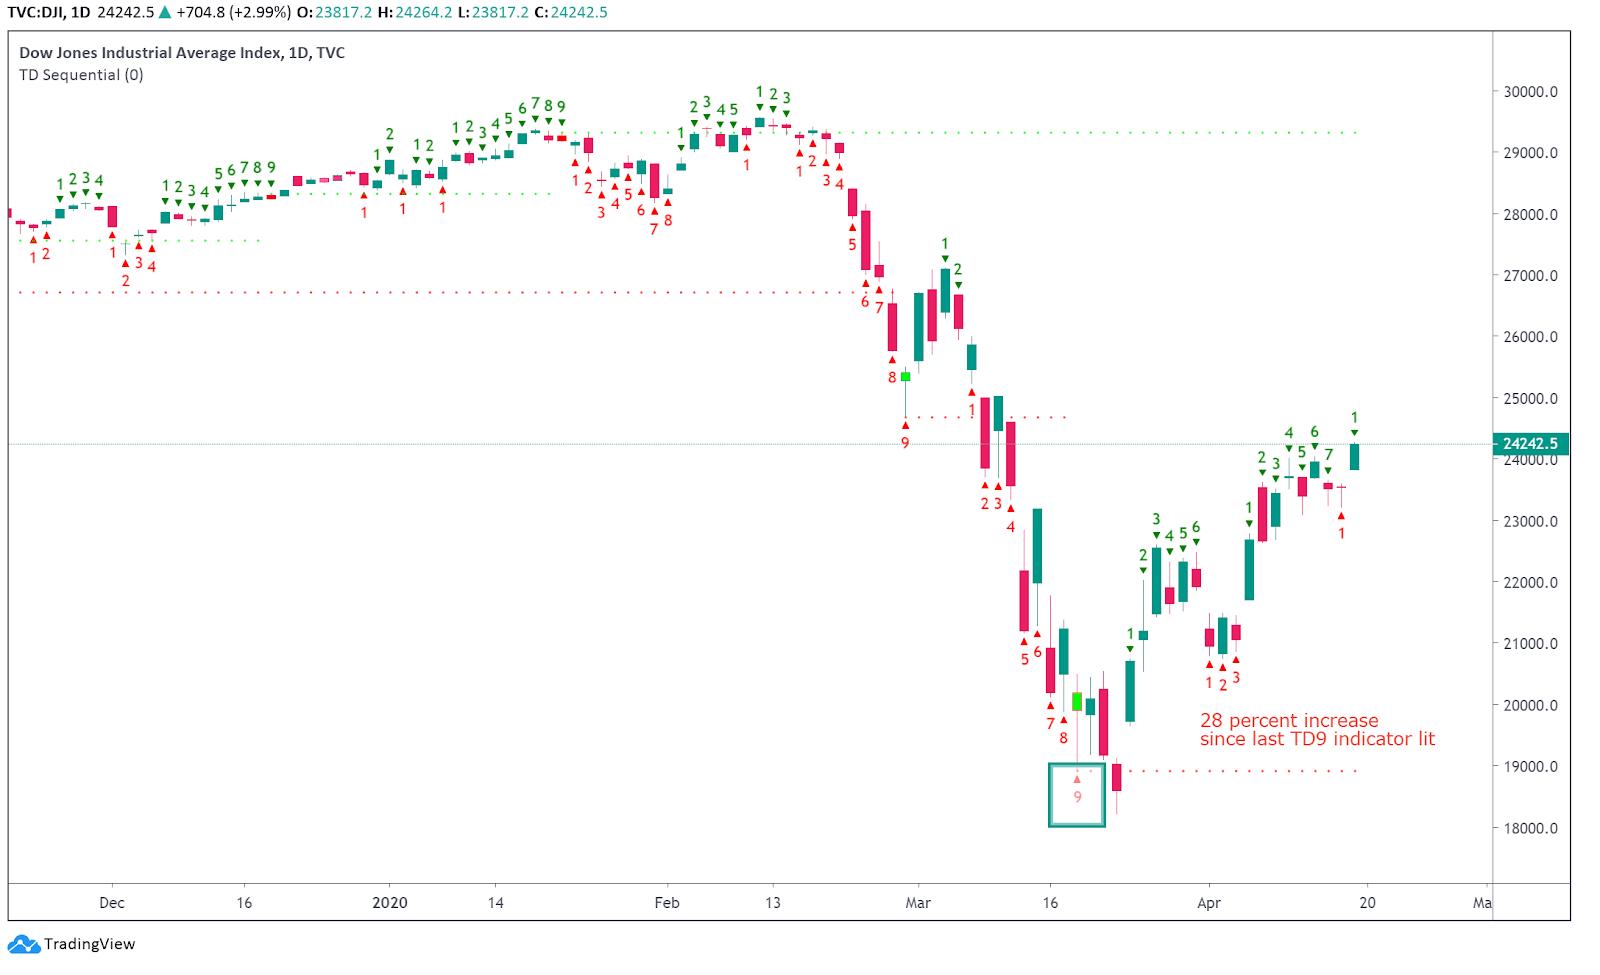 Dow Jones Industrial Average chart. Source: Tradingview